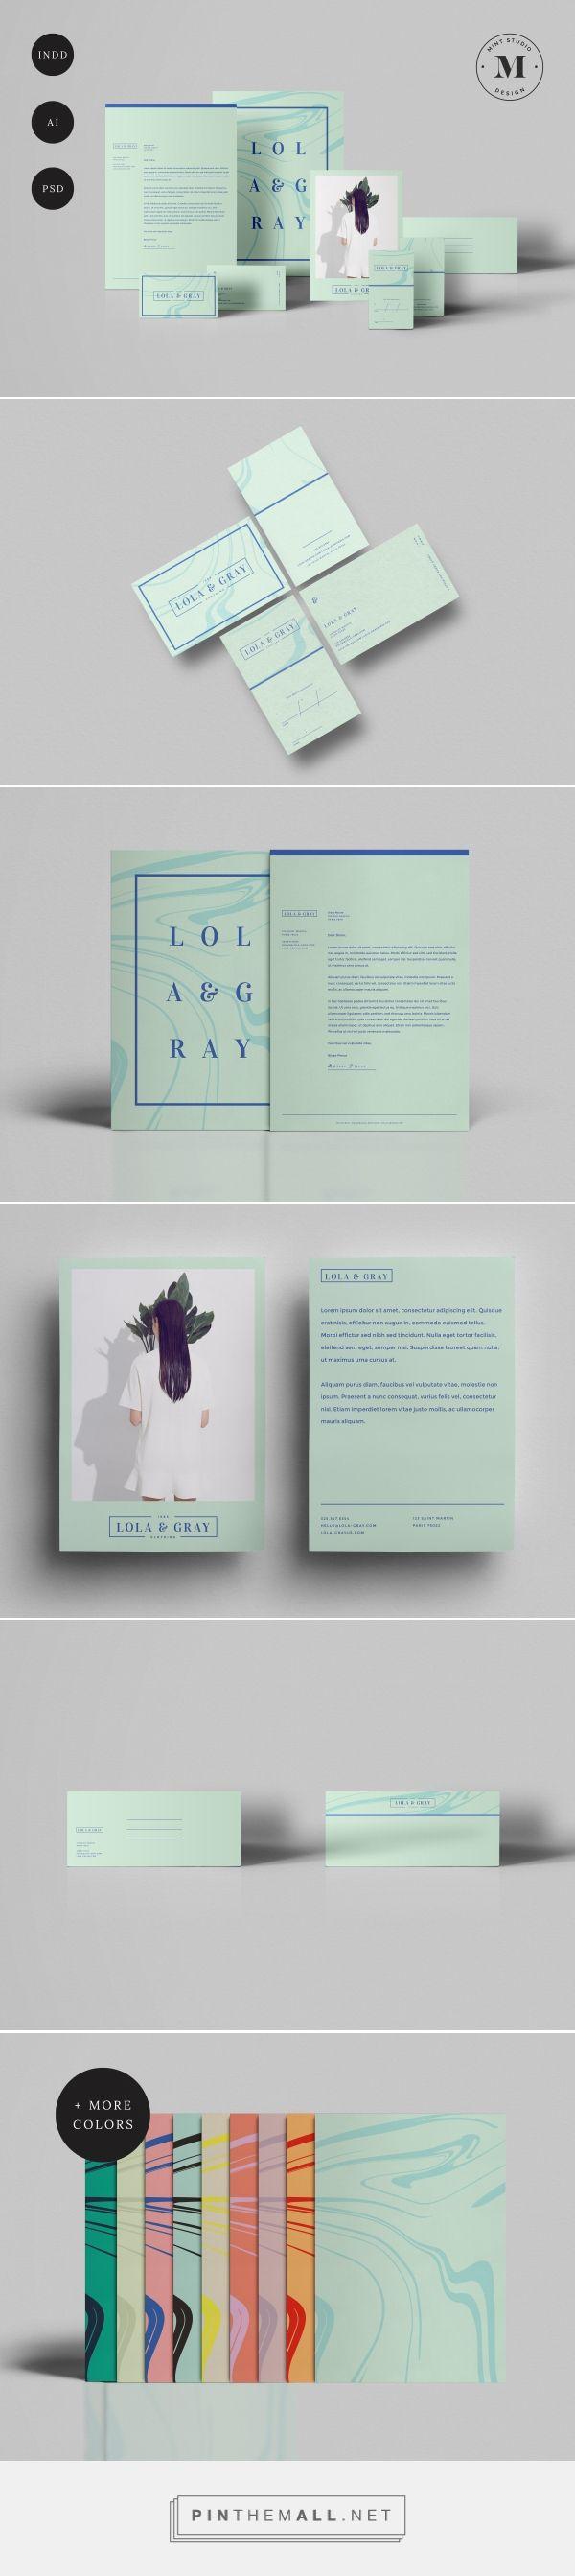 Lola & Gray Branding by Mint Studio Design | Fivestar Branding